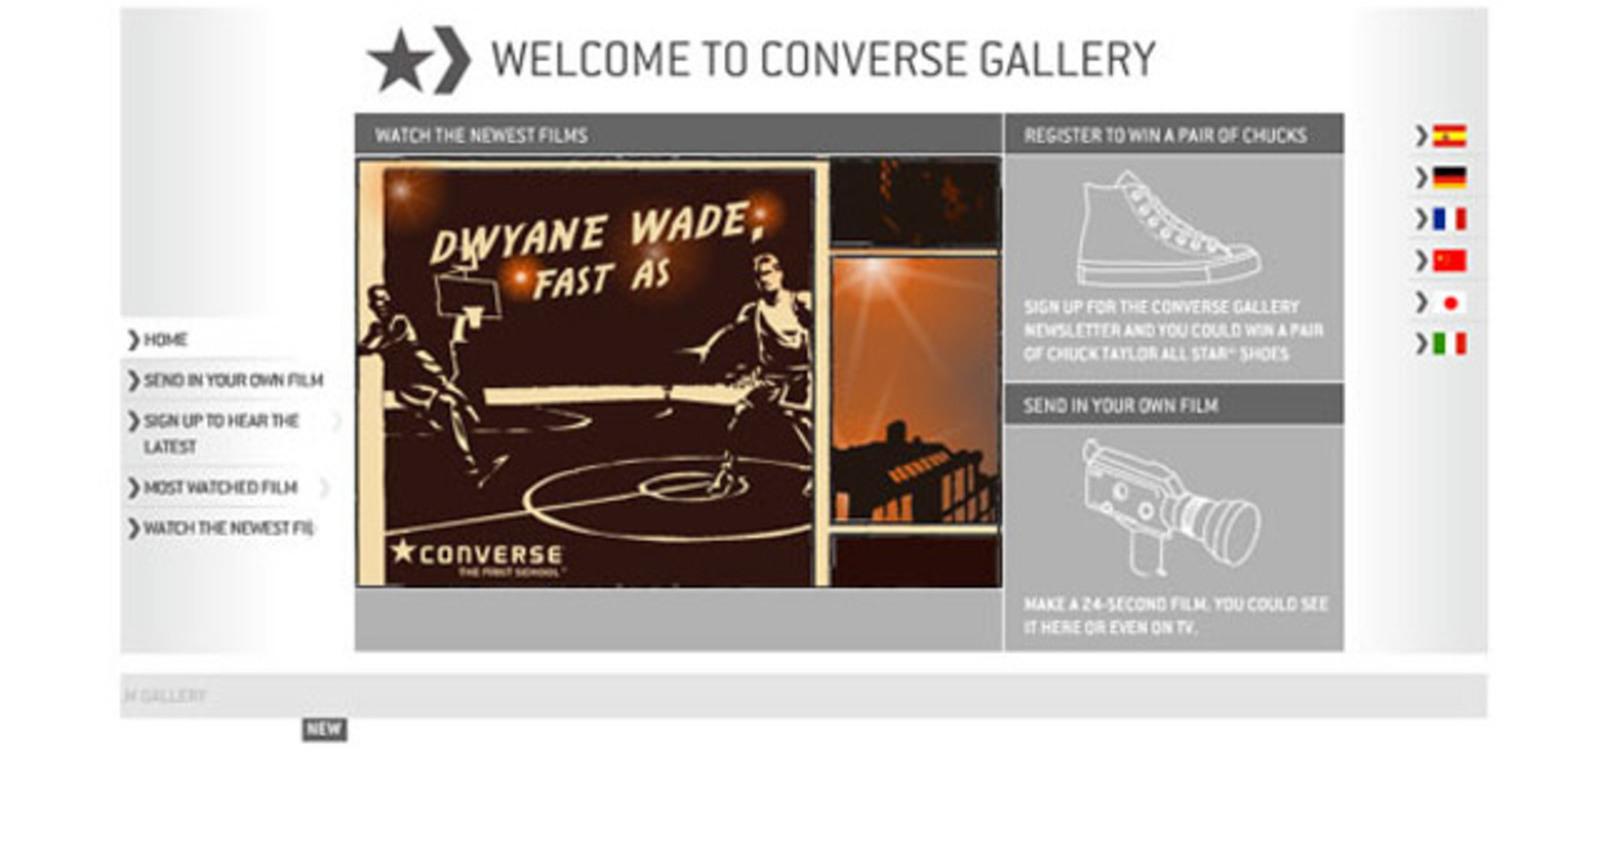 ConverseGallery.com